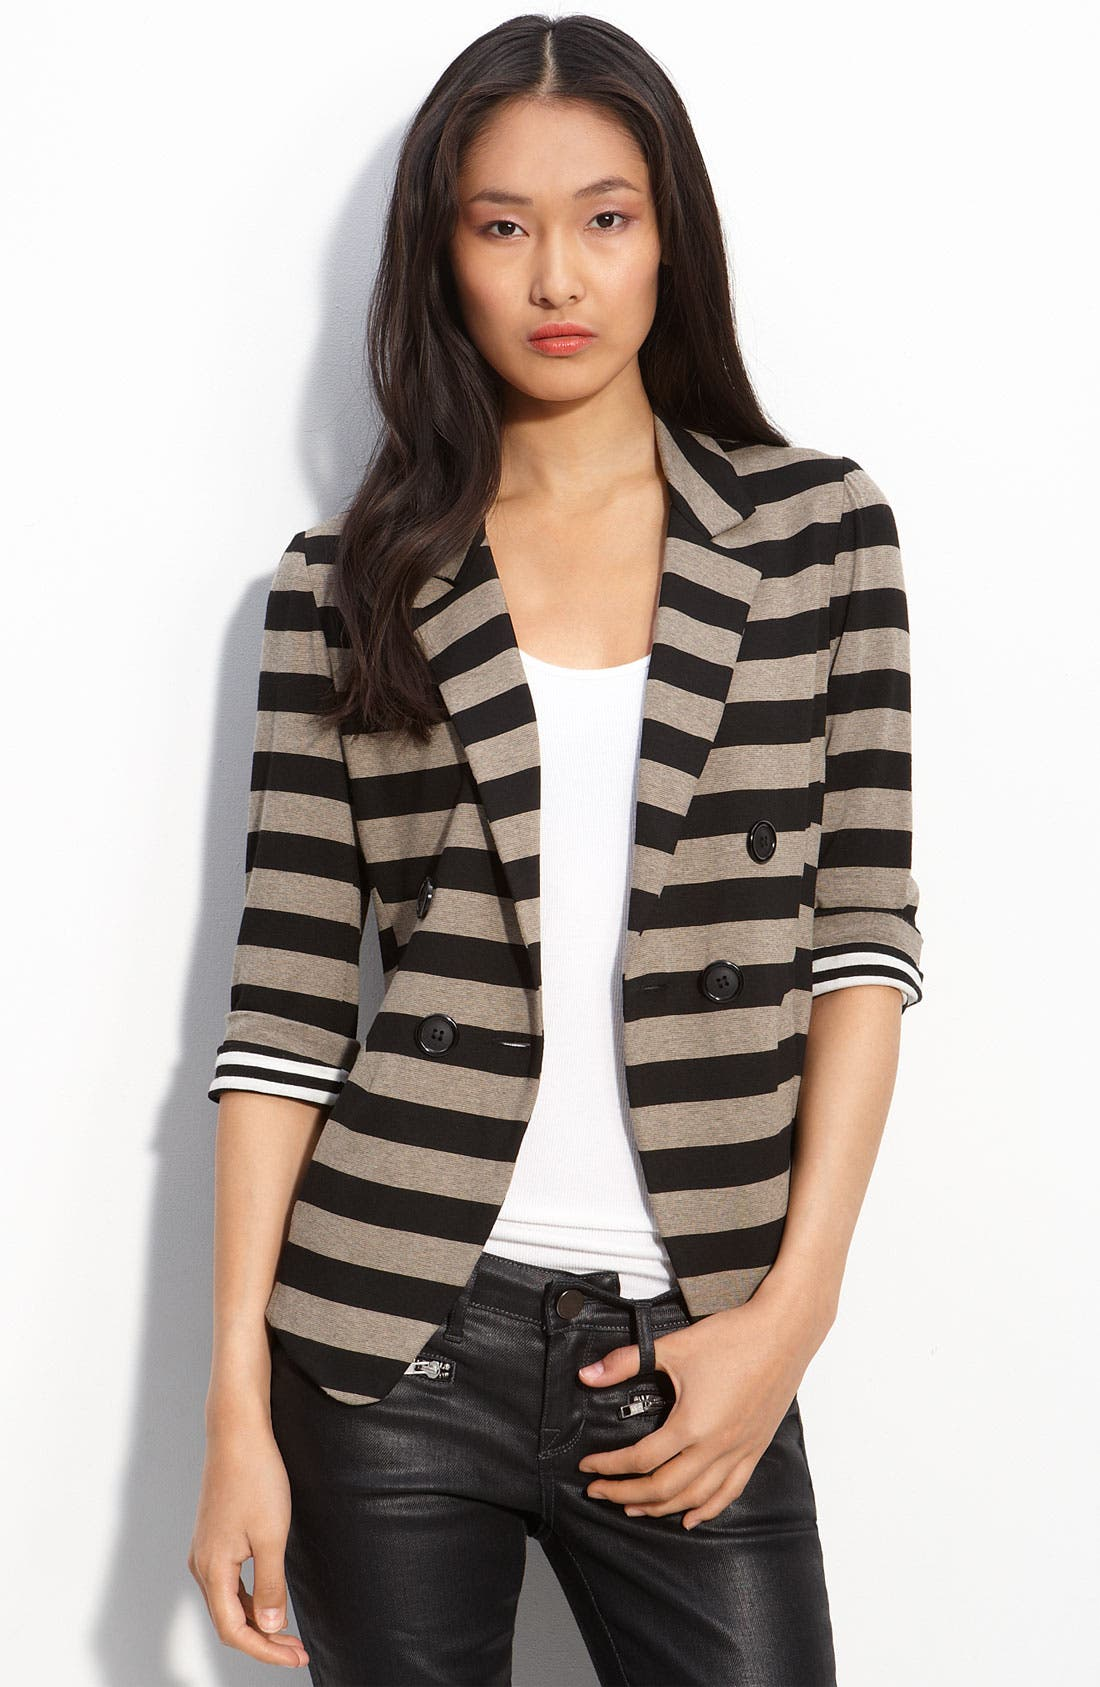 Alternate Image 1 Selected - Bailey 44 'Joie de Vivre' Knit Jacket